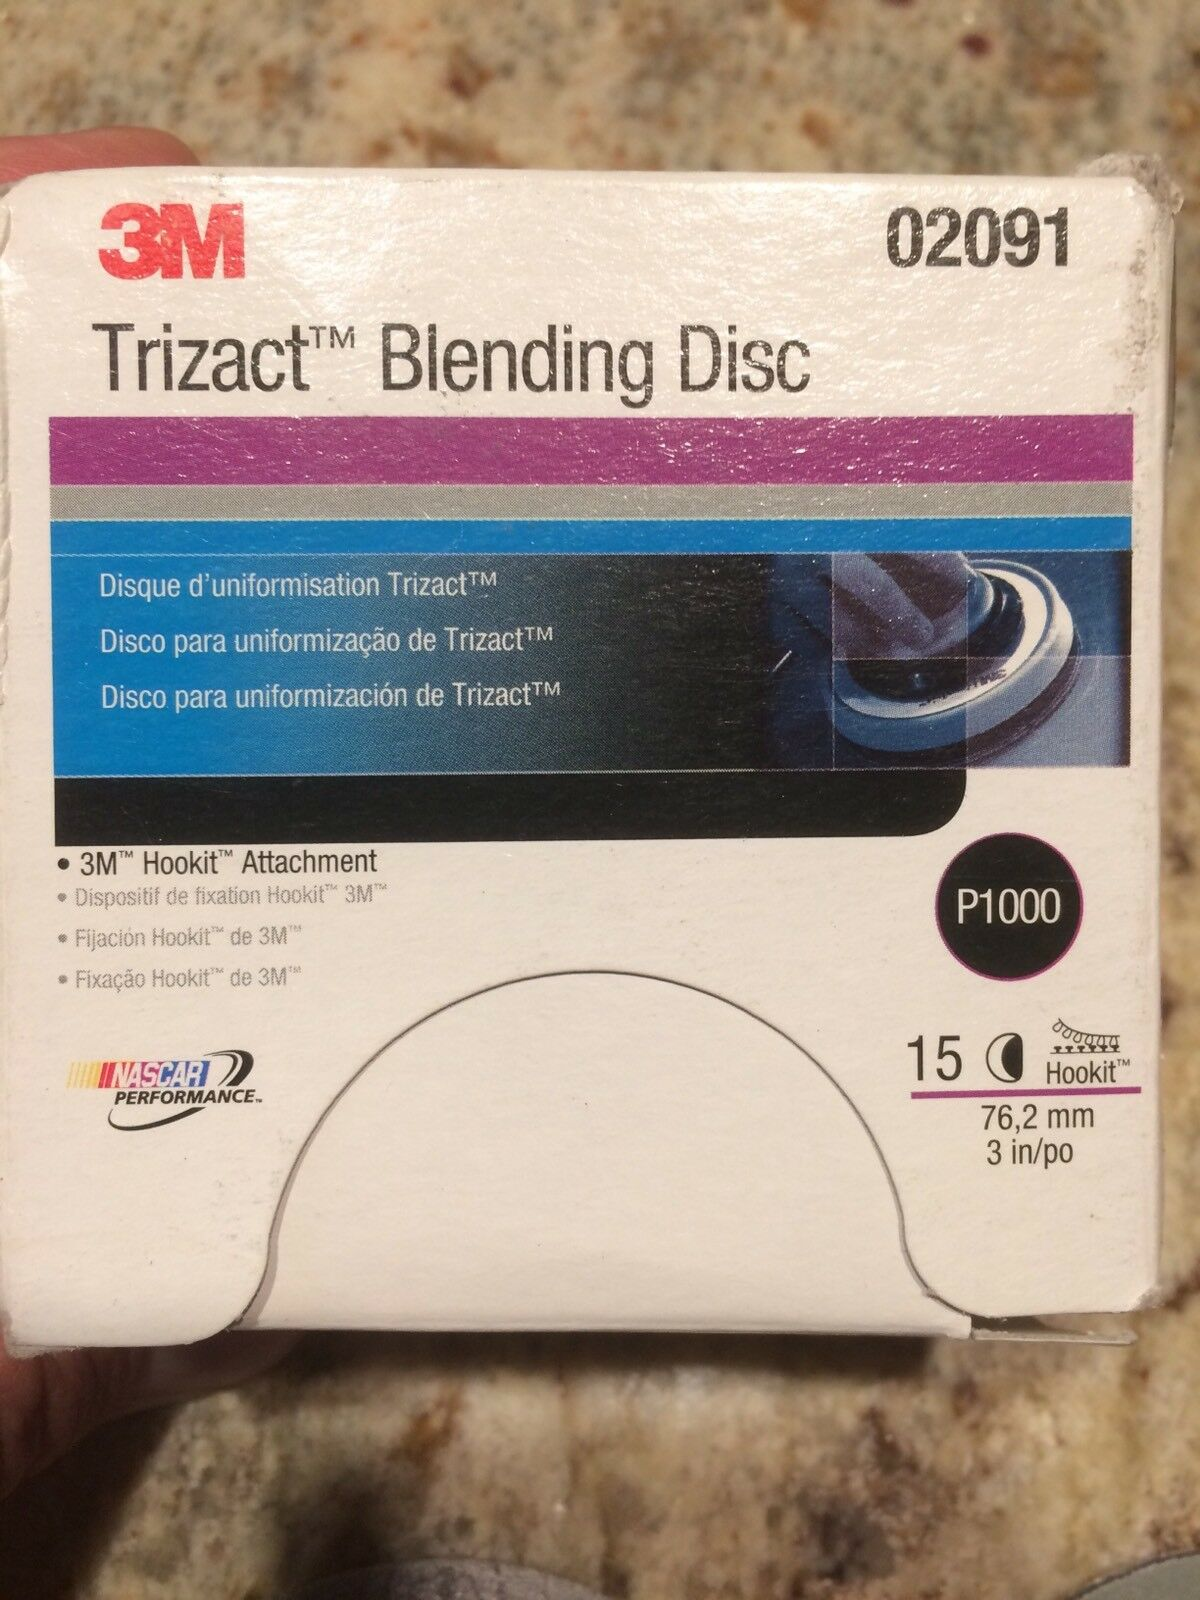 P1000 Grit 3 Inch 3M 02091 Trizact Hookit Blending Disc 15 Discs Per Box